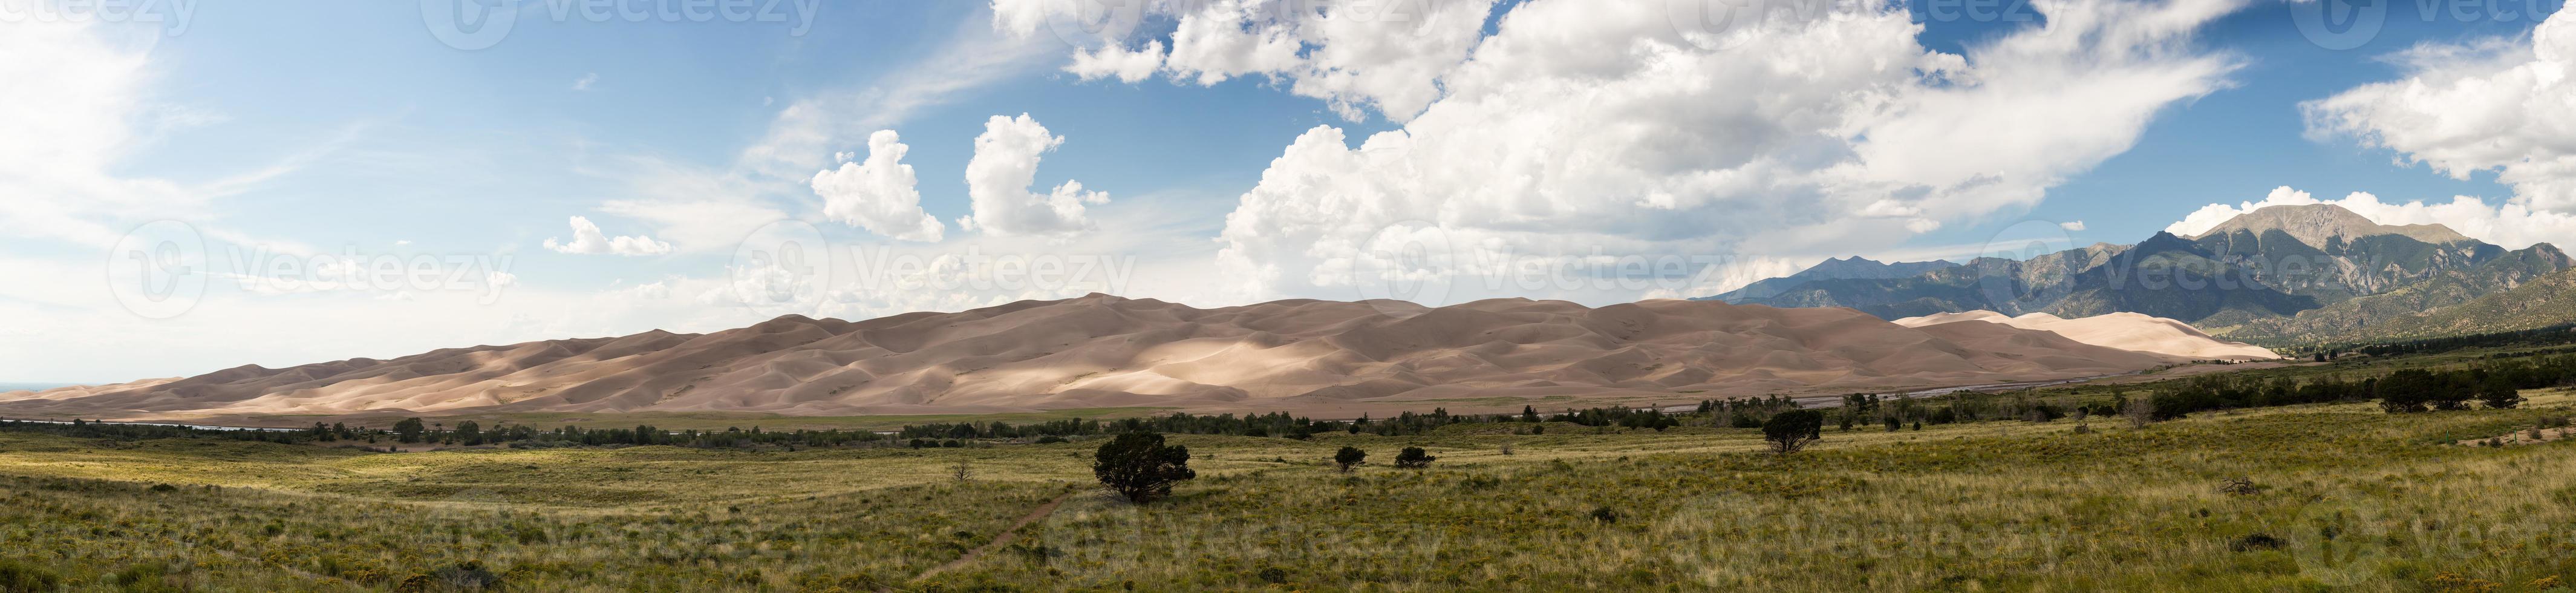 Panorama of Great Sand Dunes NP photo